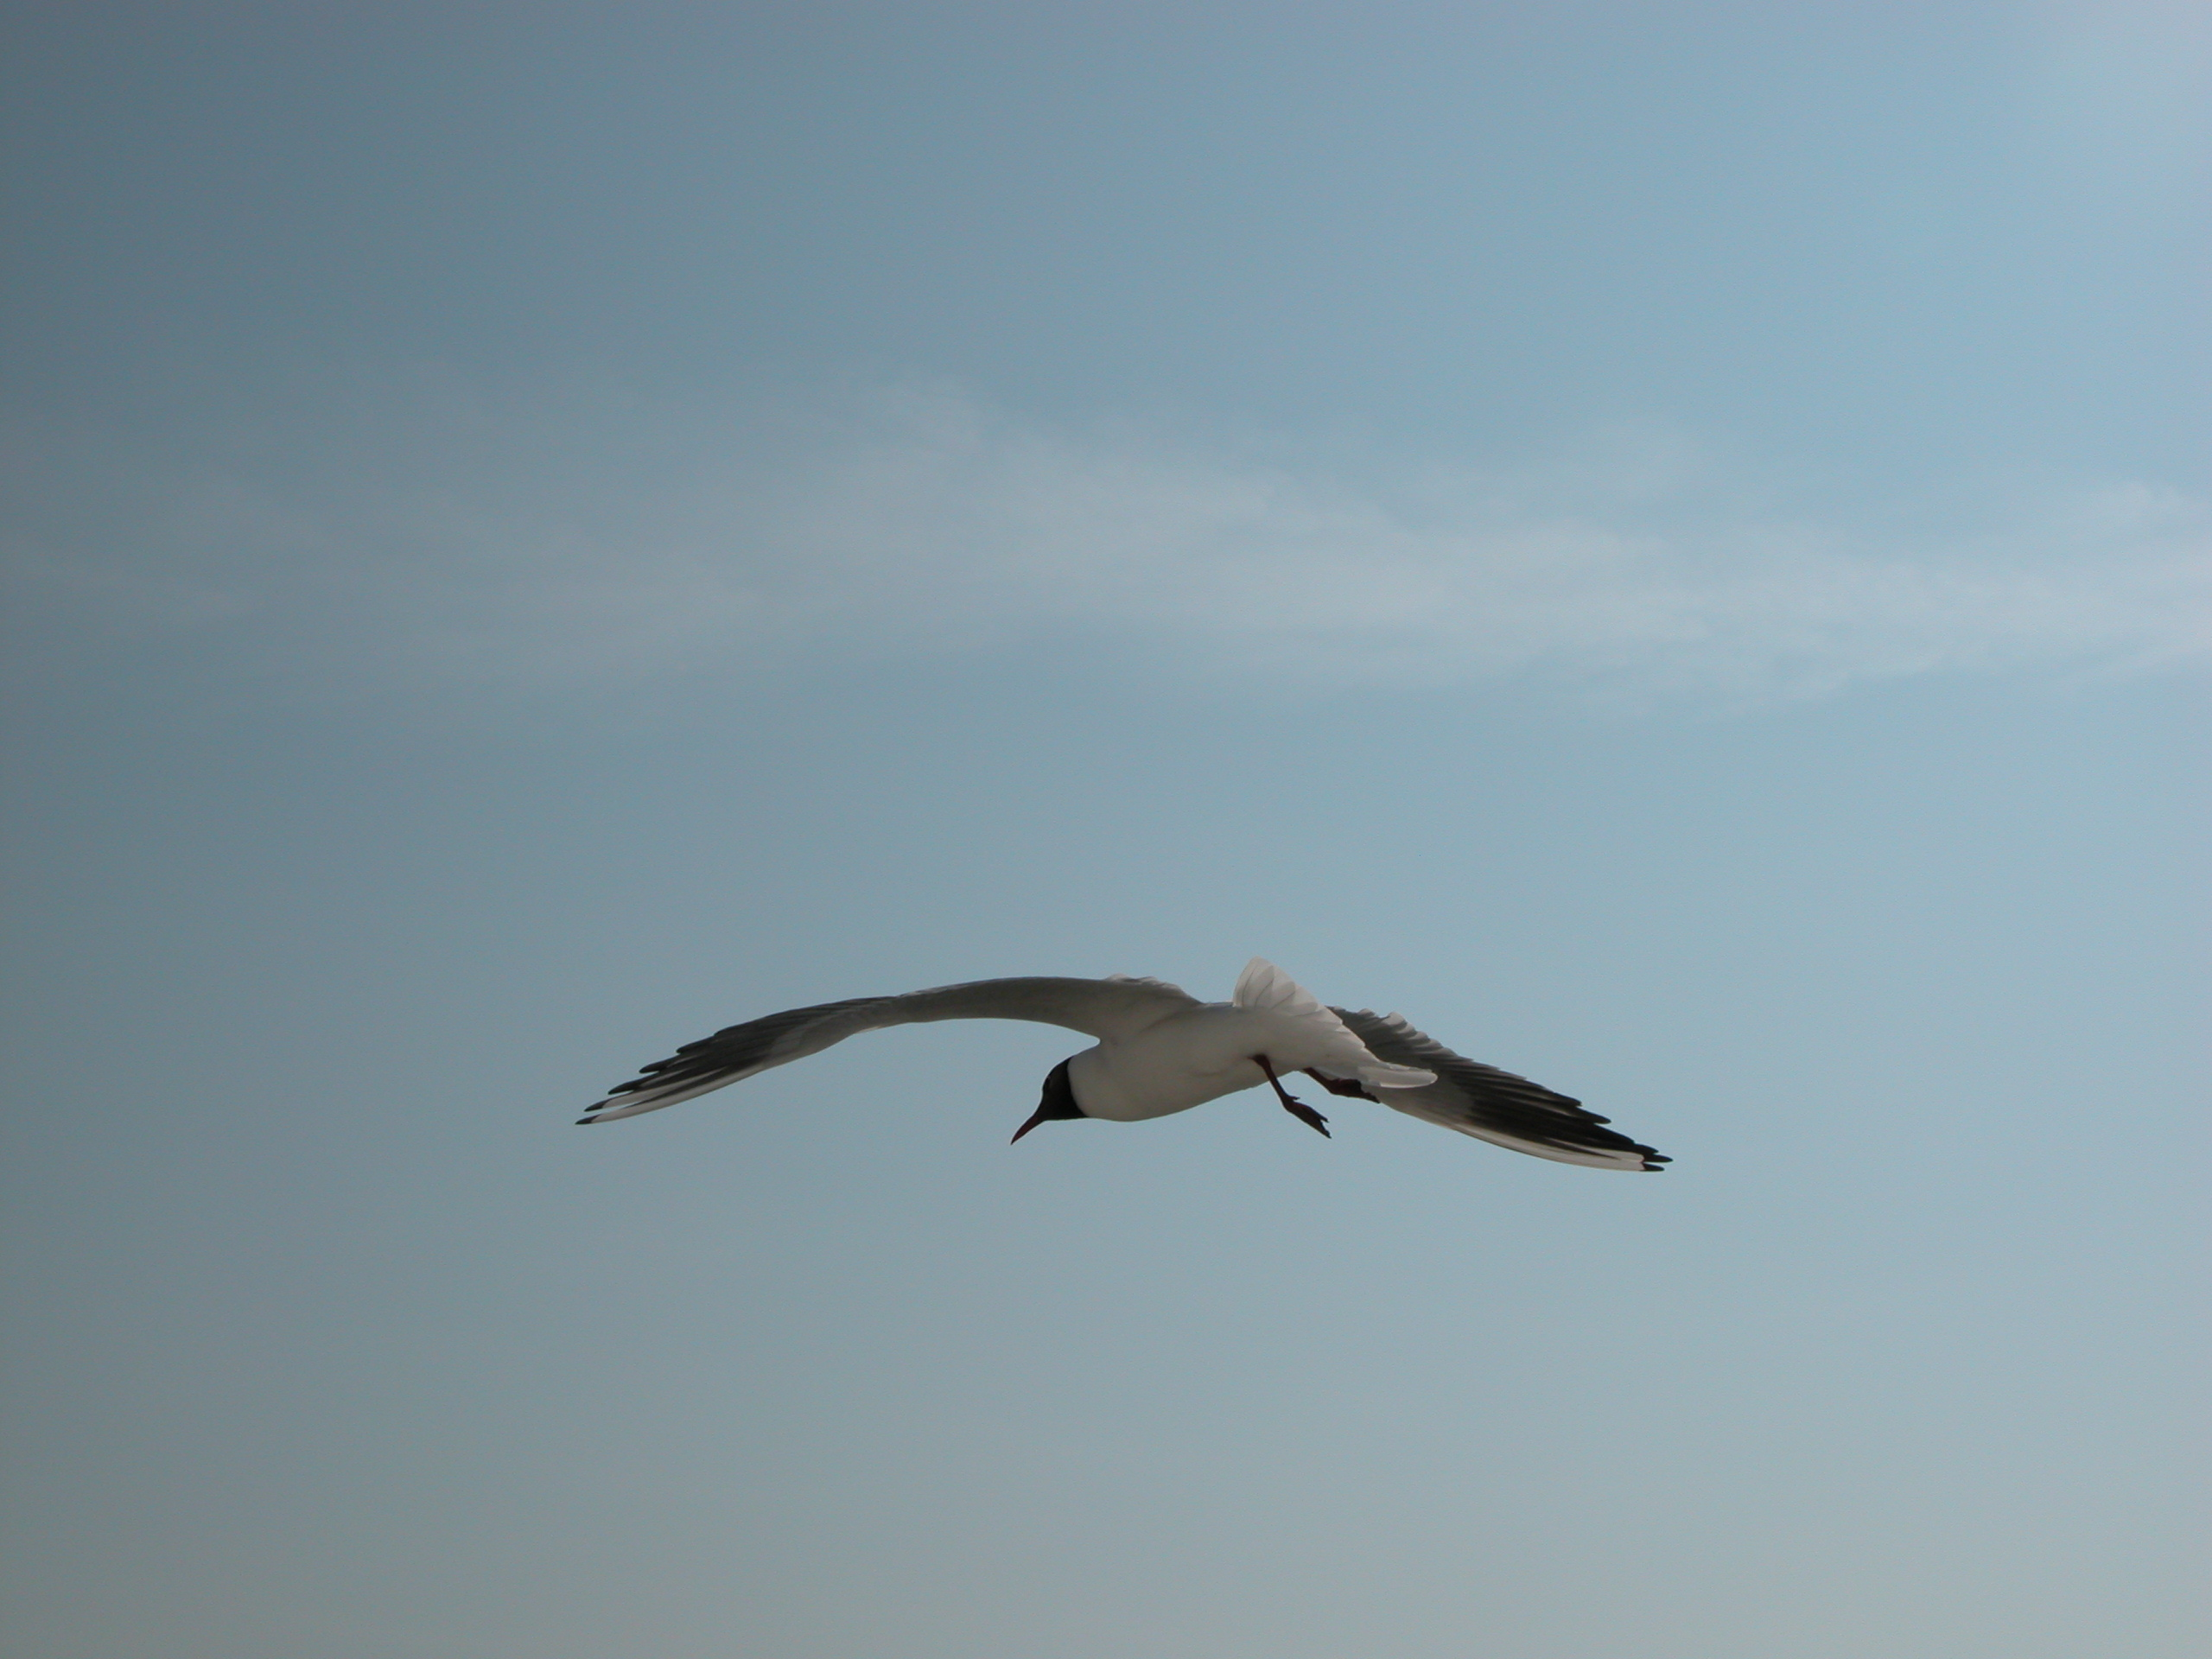 seagull gull bird flying wings wingspan